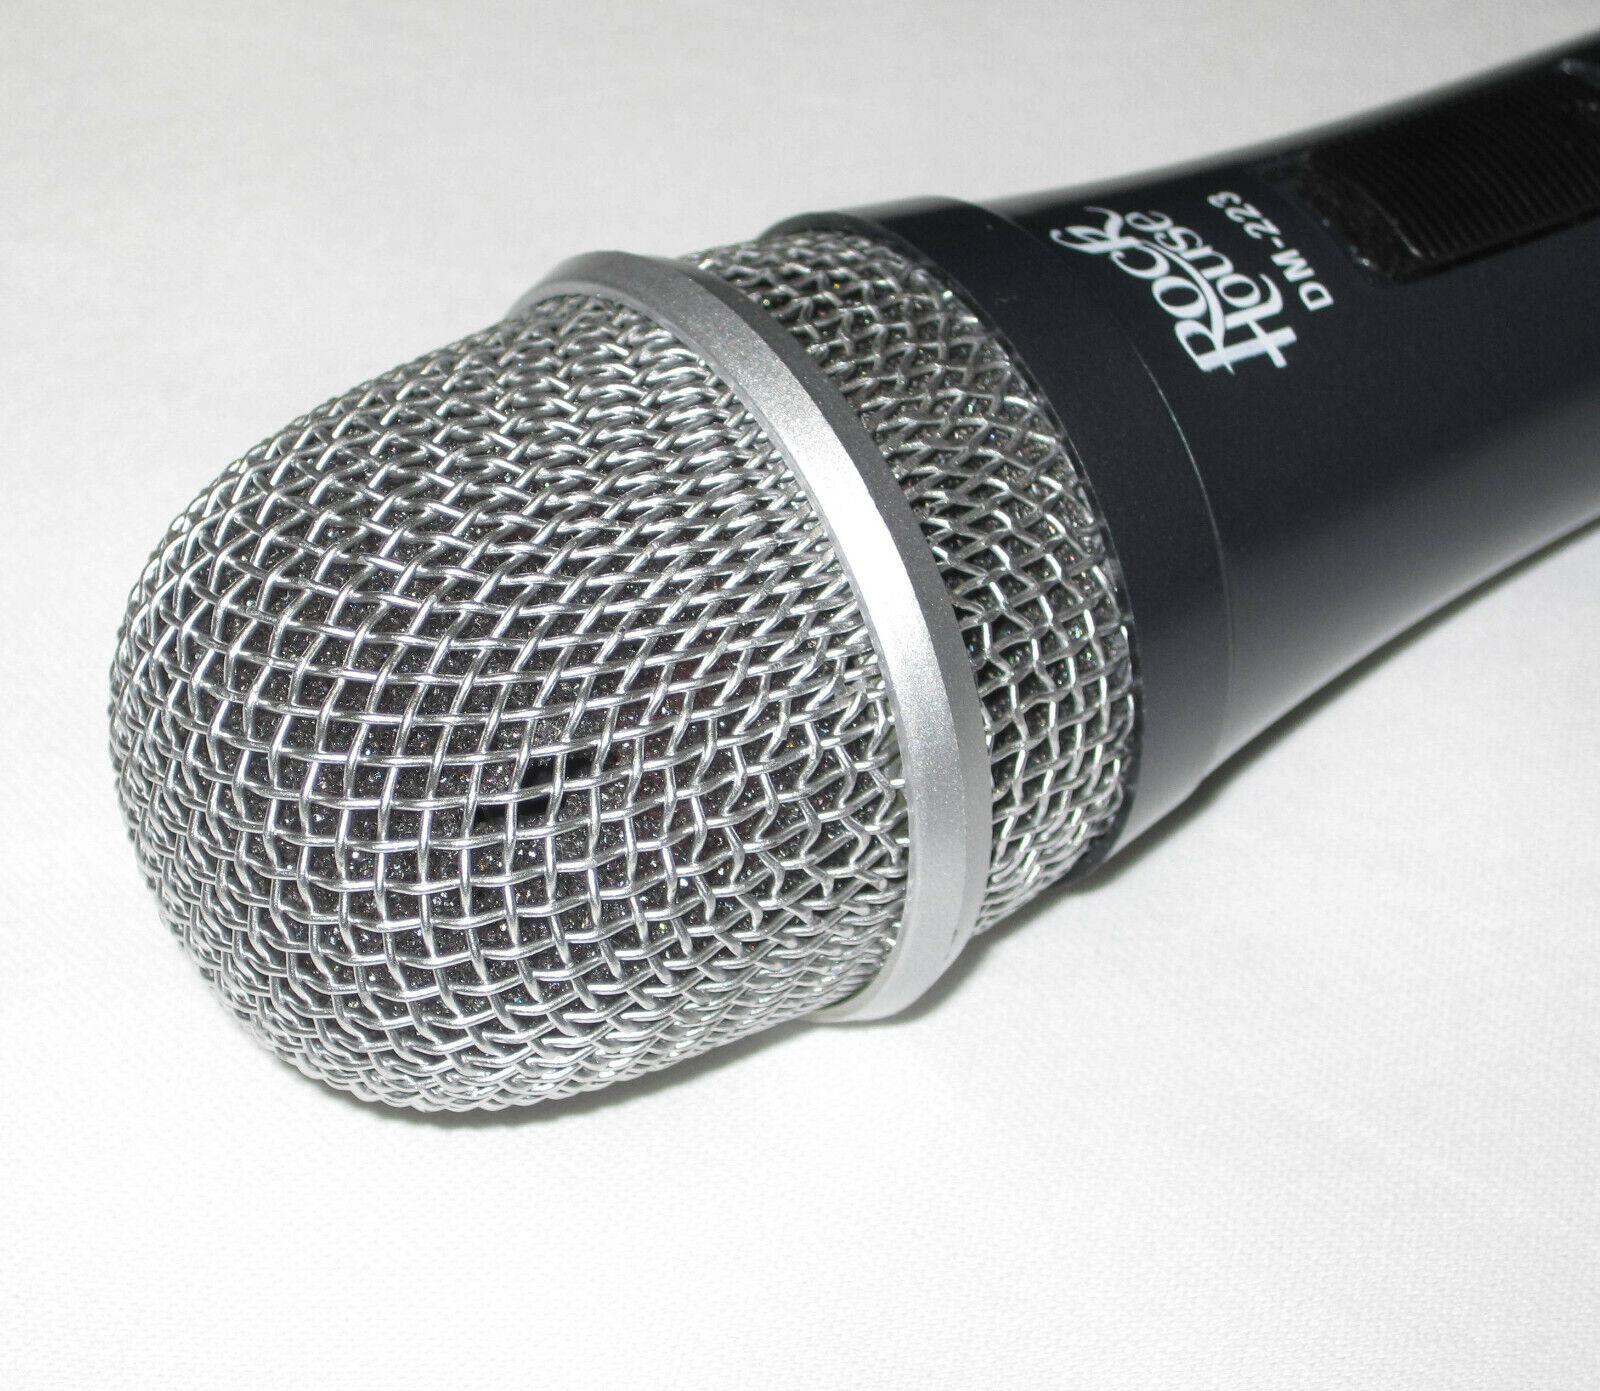 Rockhouse dynamisches Mikrofon DM-223 grau  #7241